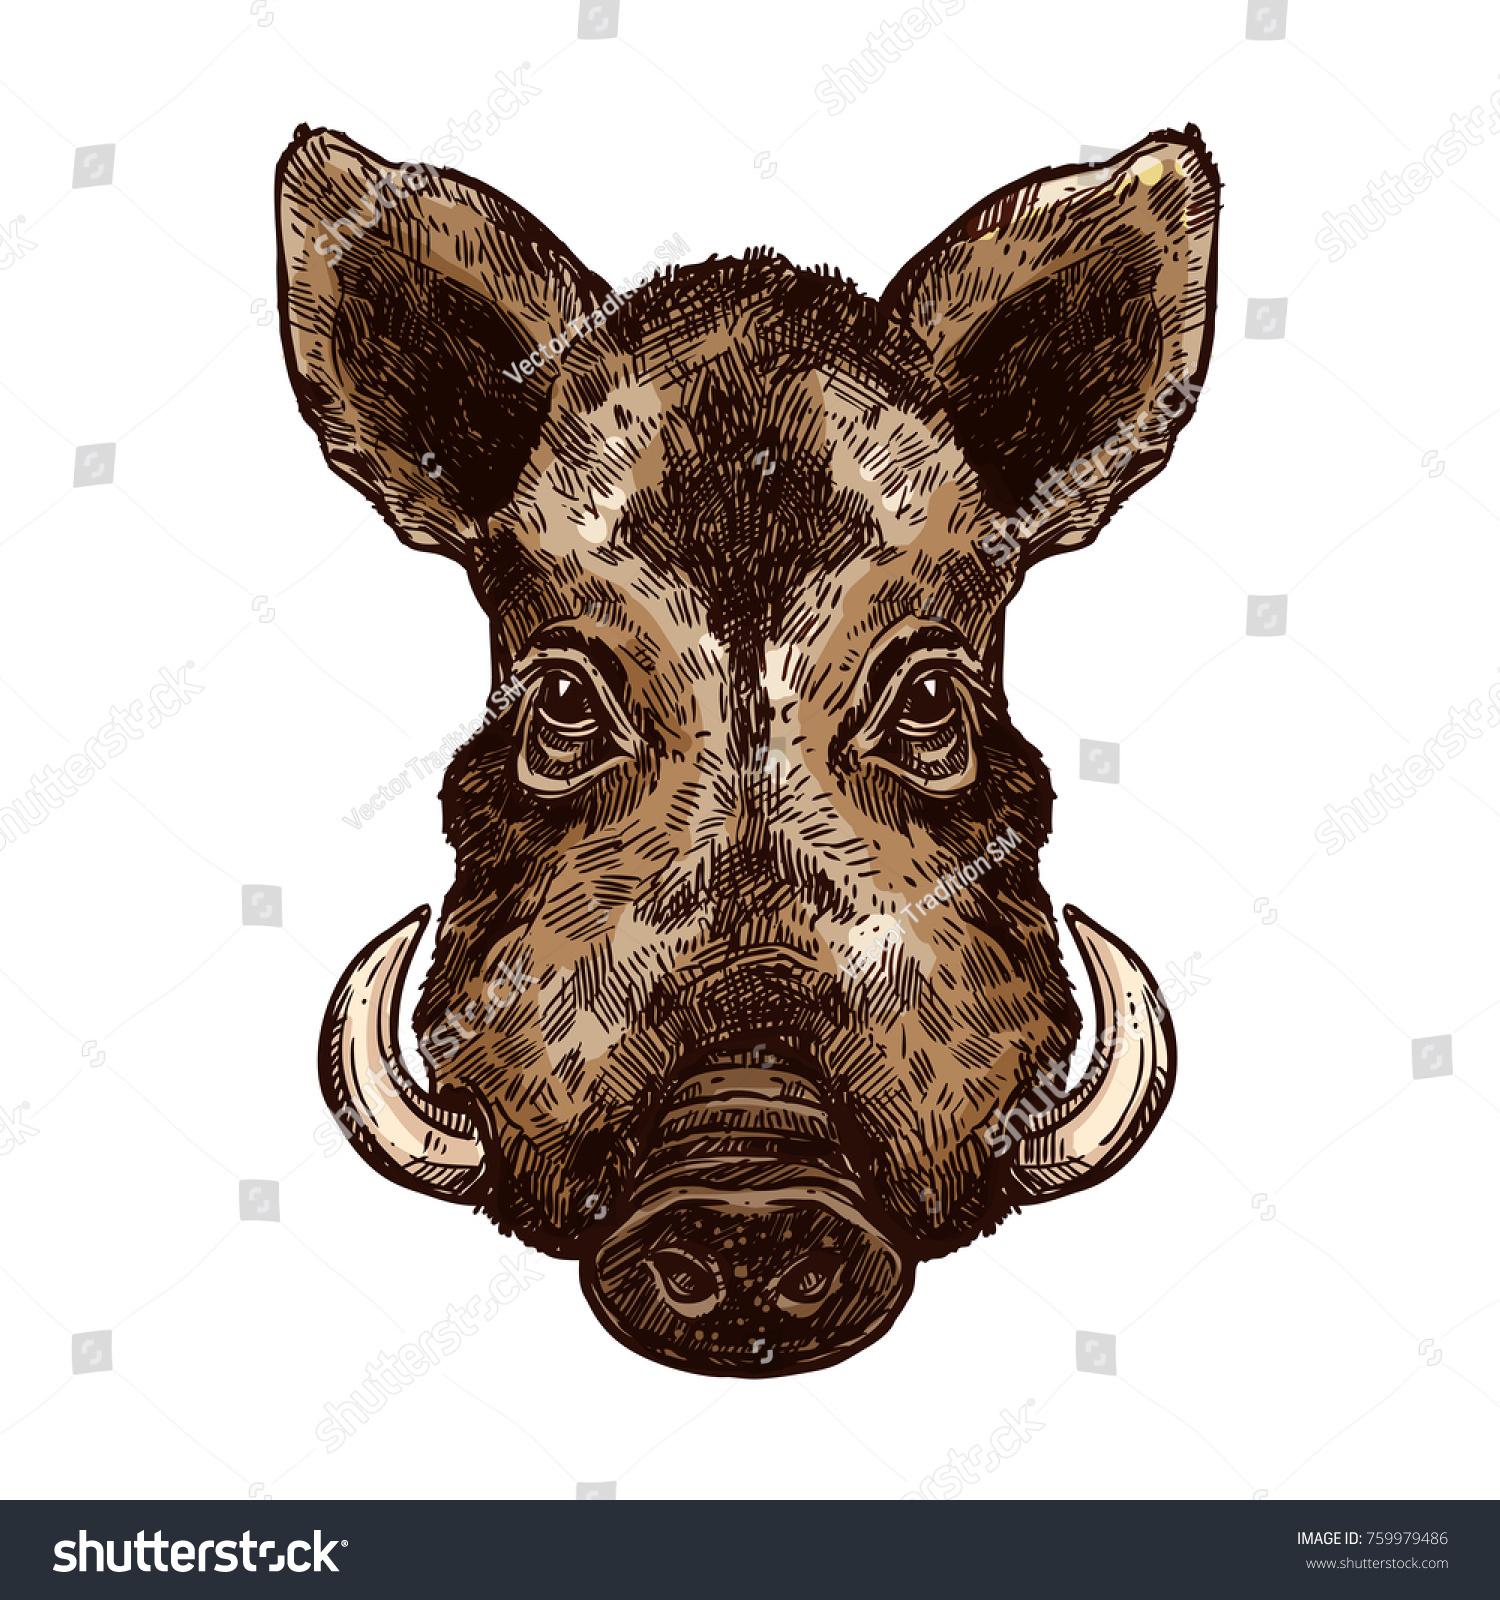 Boar Wild Pig Animal Sketch Hog Stock Vector 2018 759979486